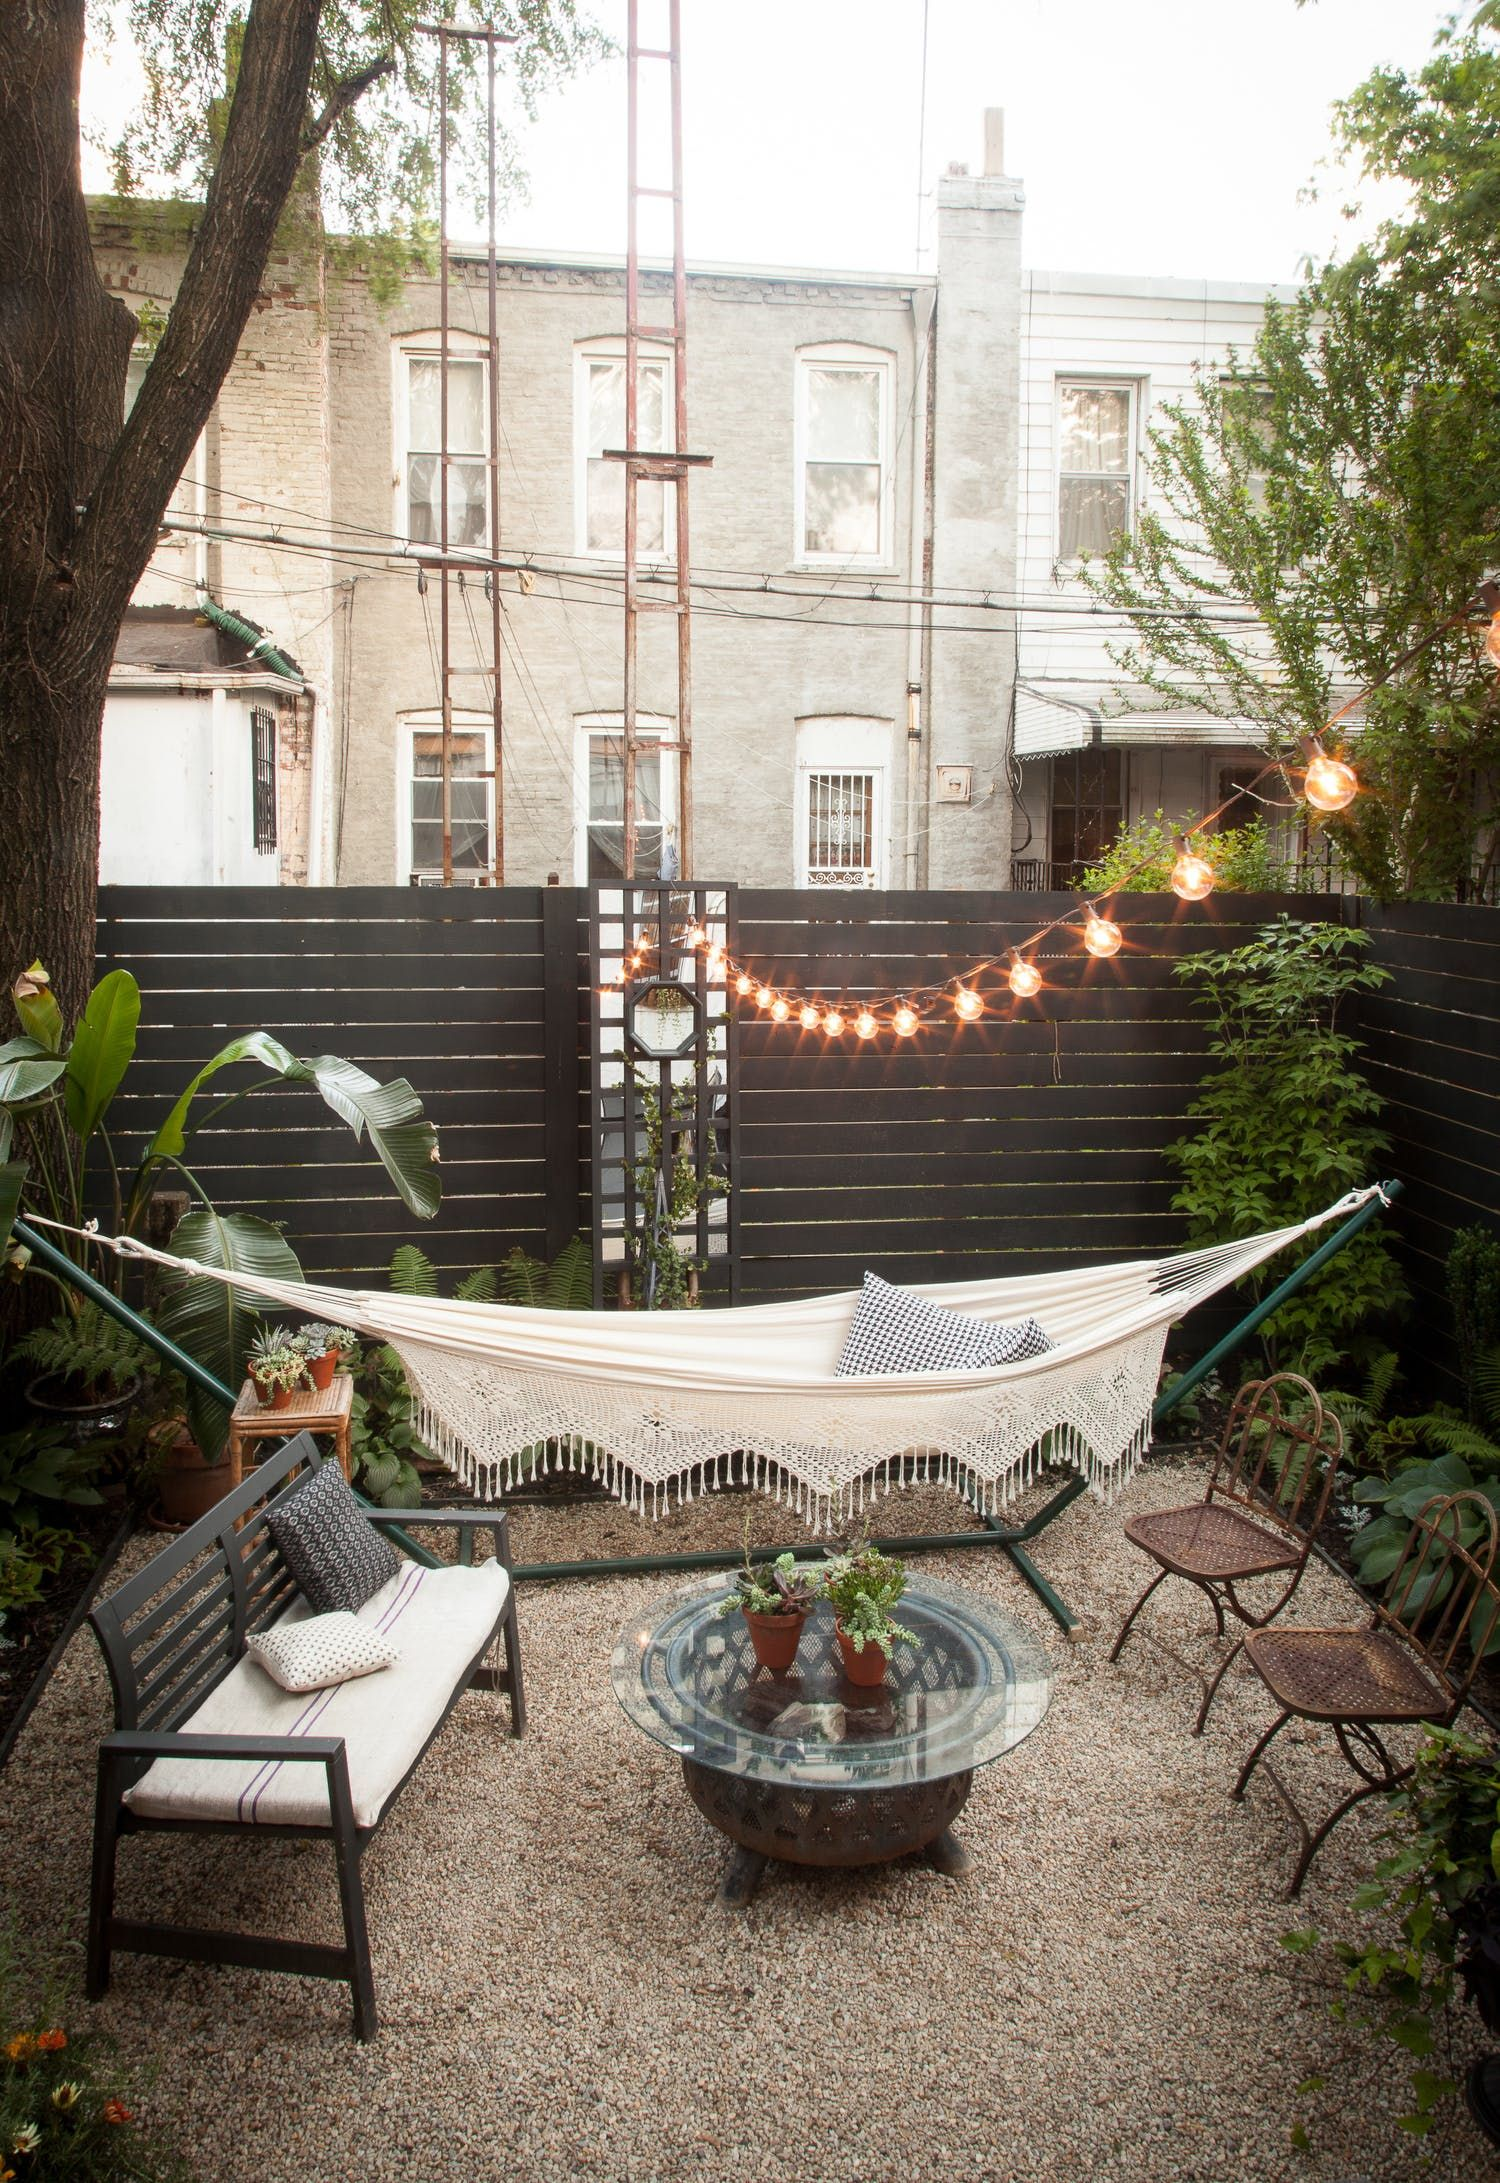 rachel u0027s inspiration for a bohemian dream backyard on a budget